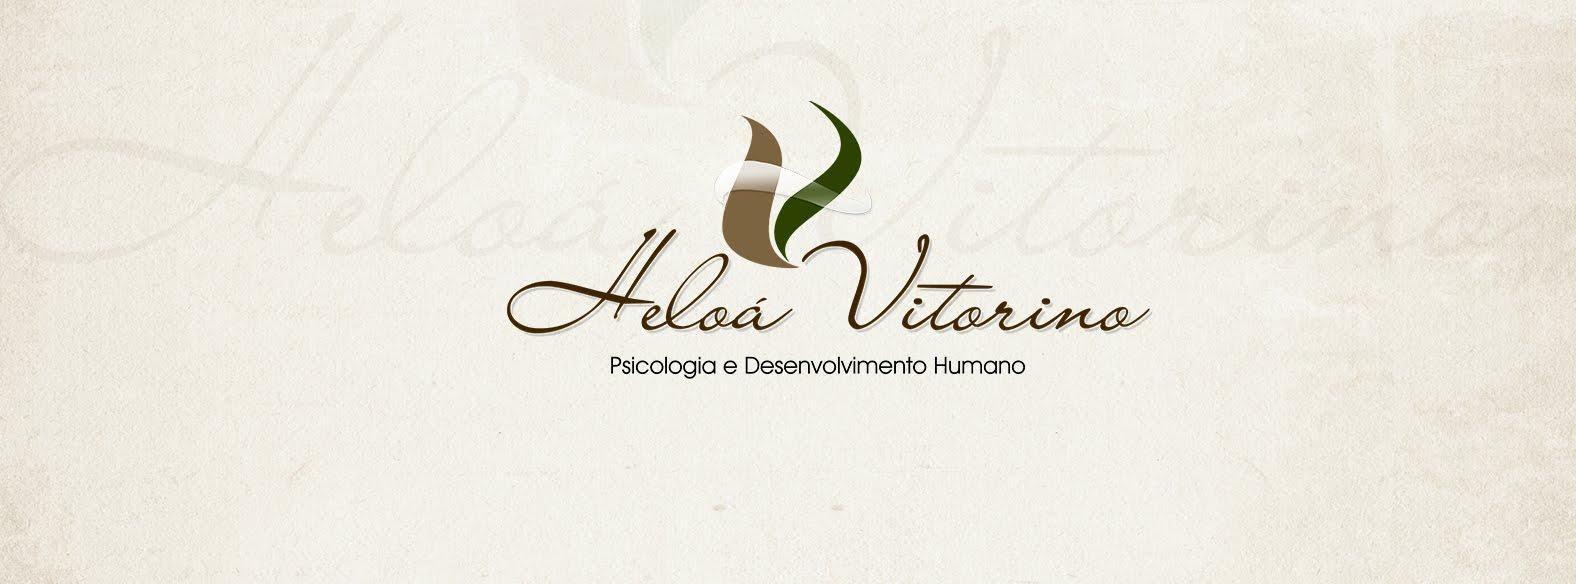 Painel de Ideias - Psicóloga Heloá Vitorino